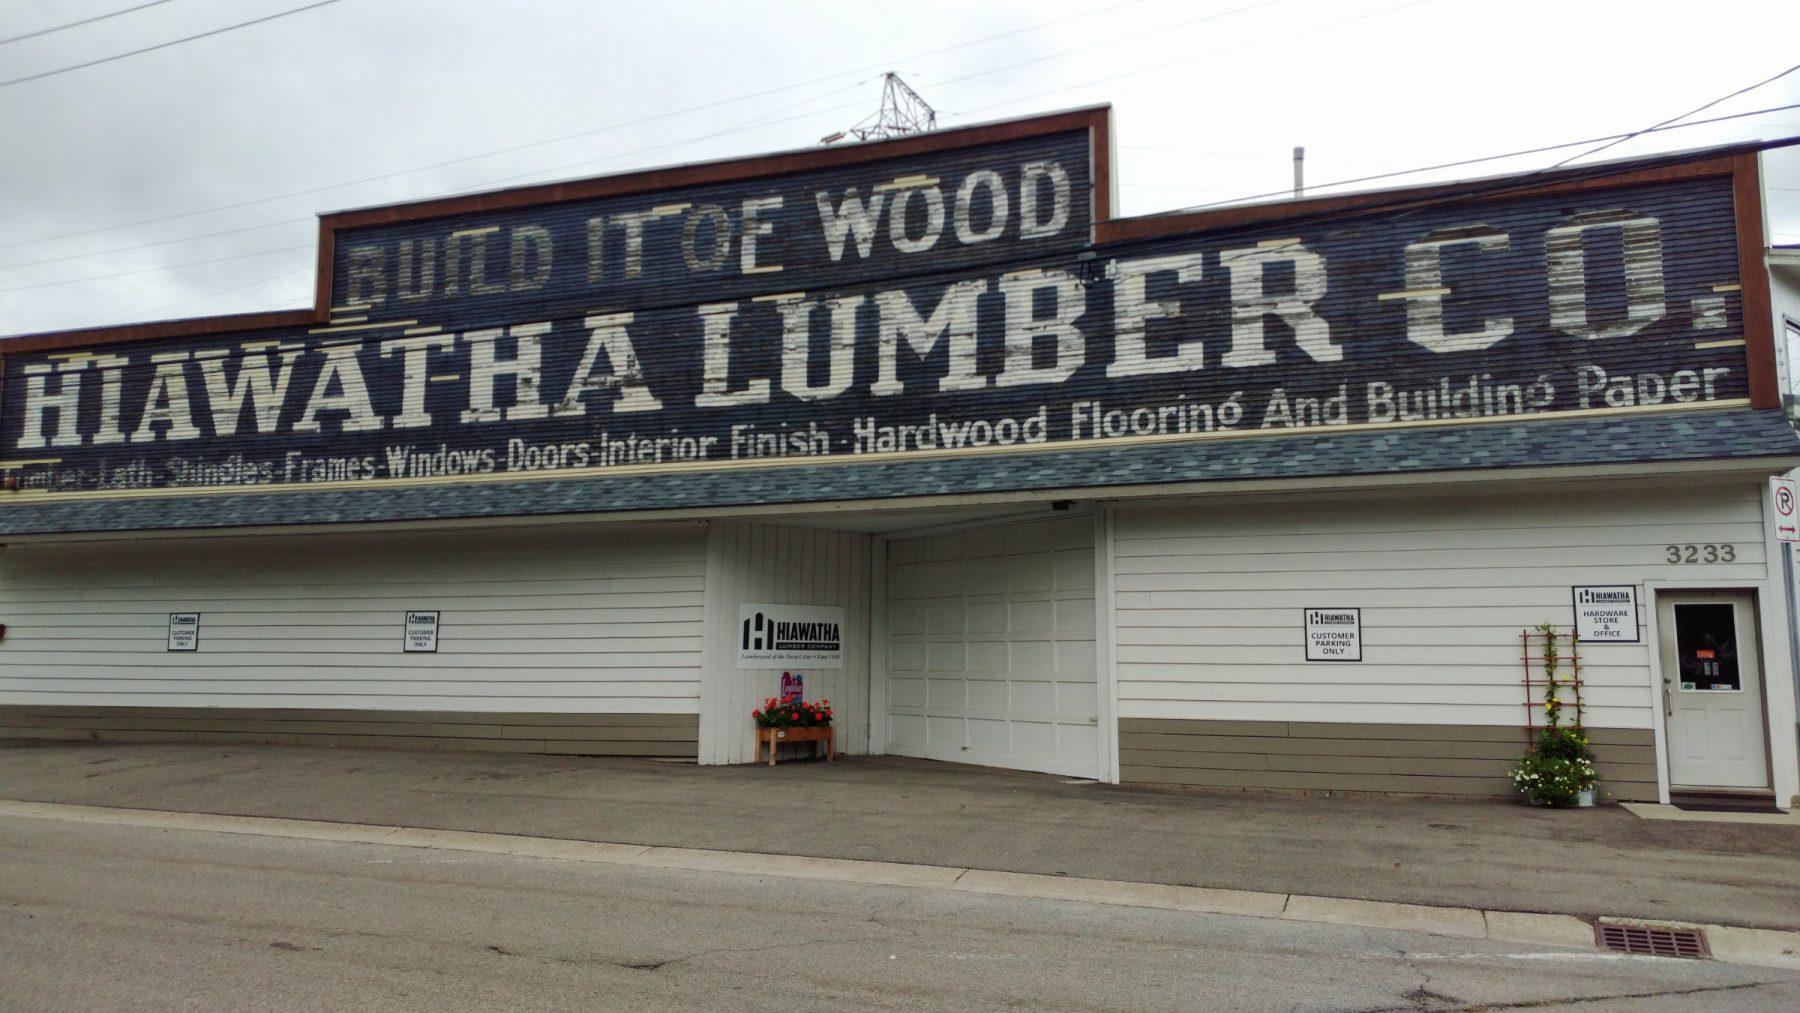 Hiawatha Lumber Co. building